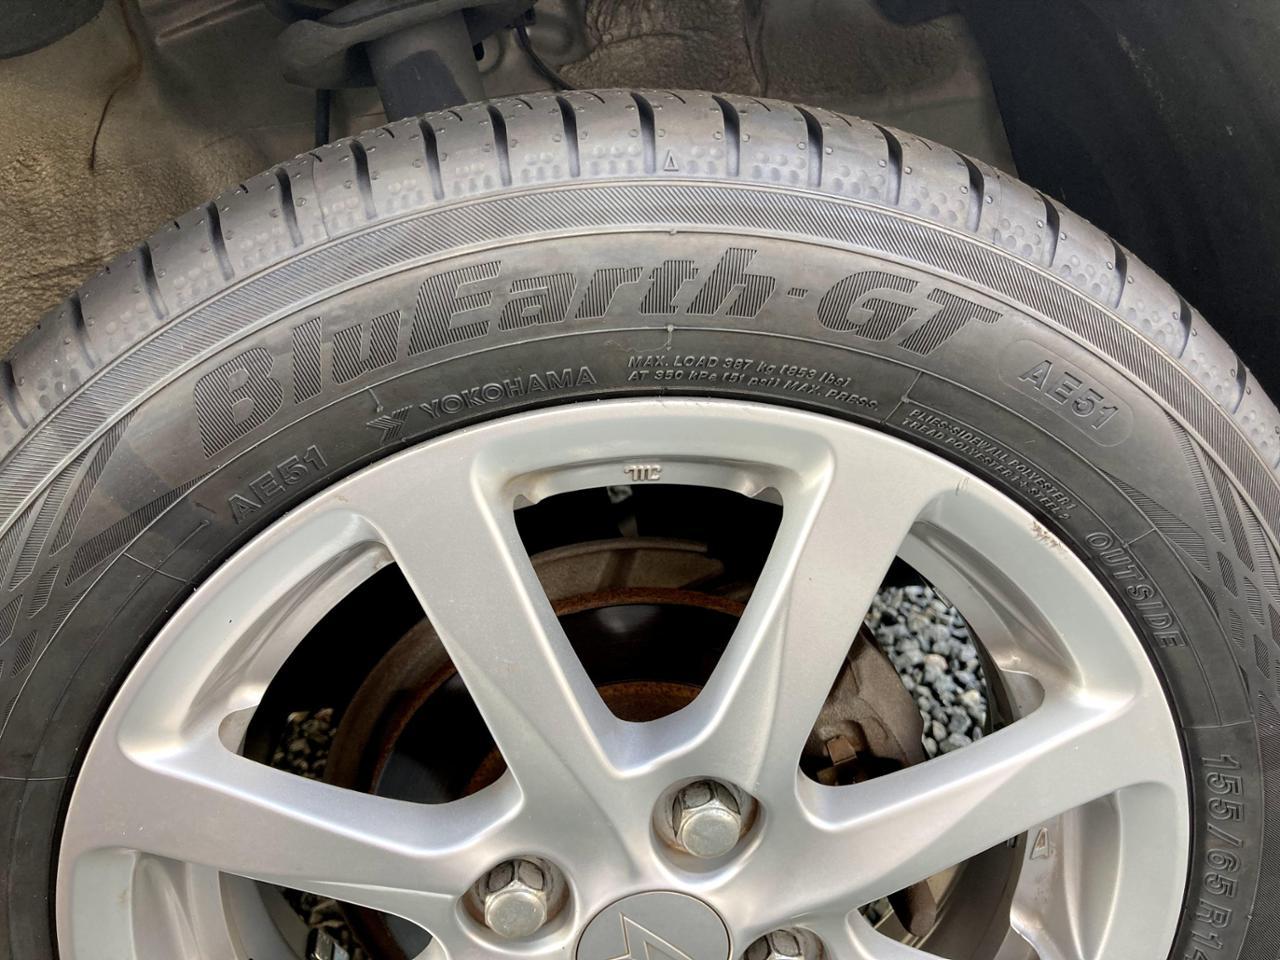 YOKOHAMA BluEarth-GT AE51 155/65R14